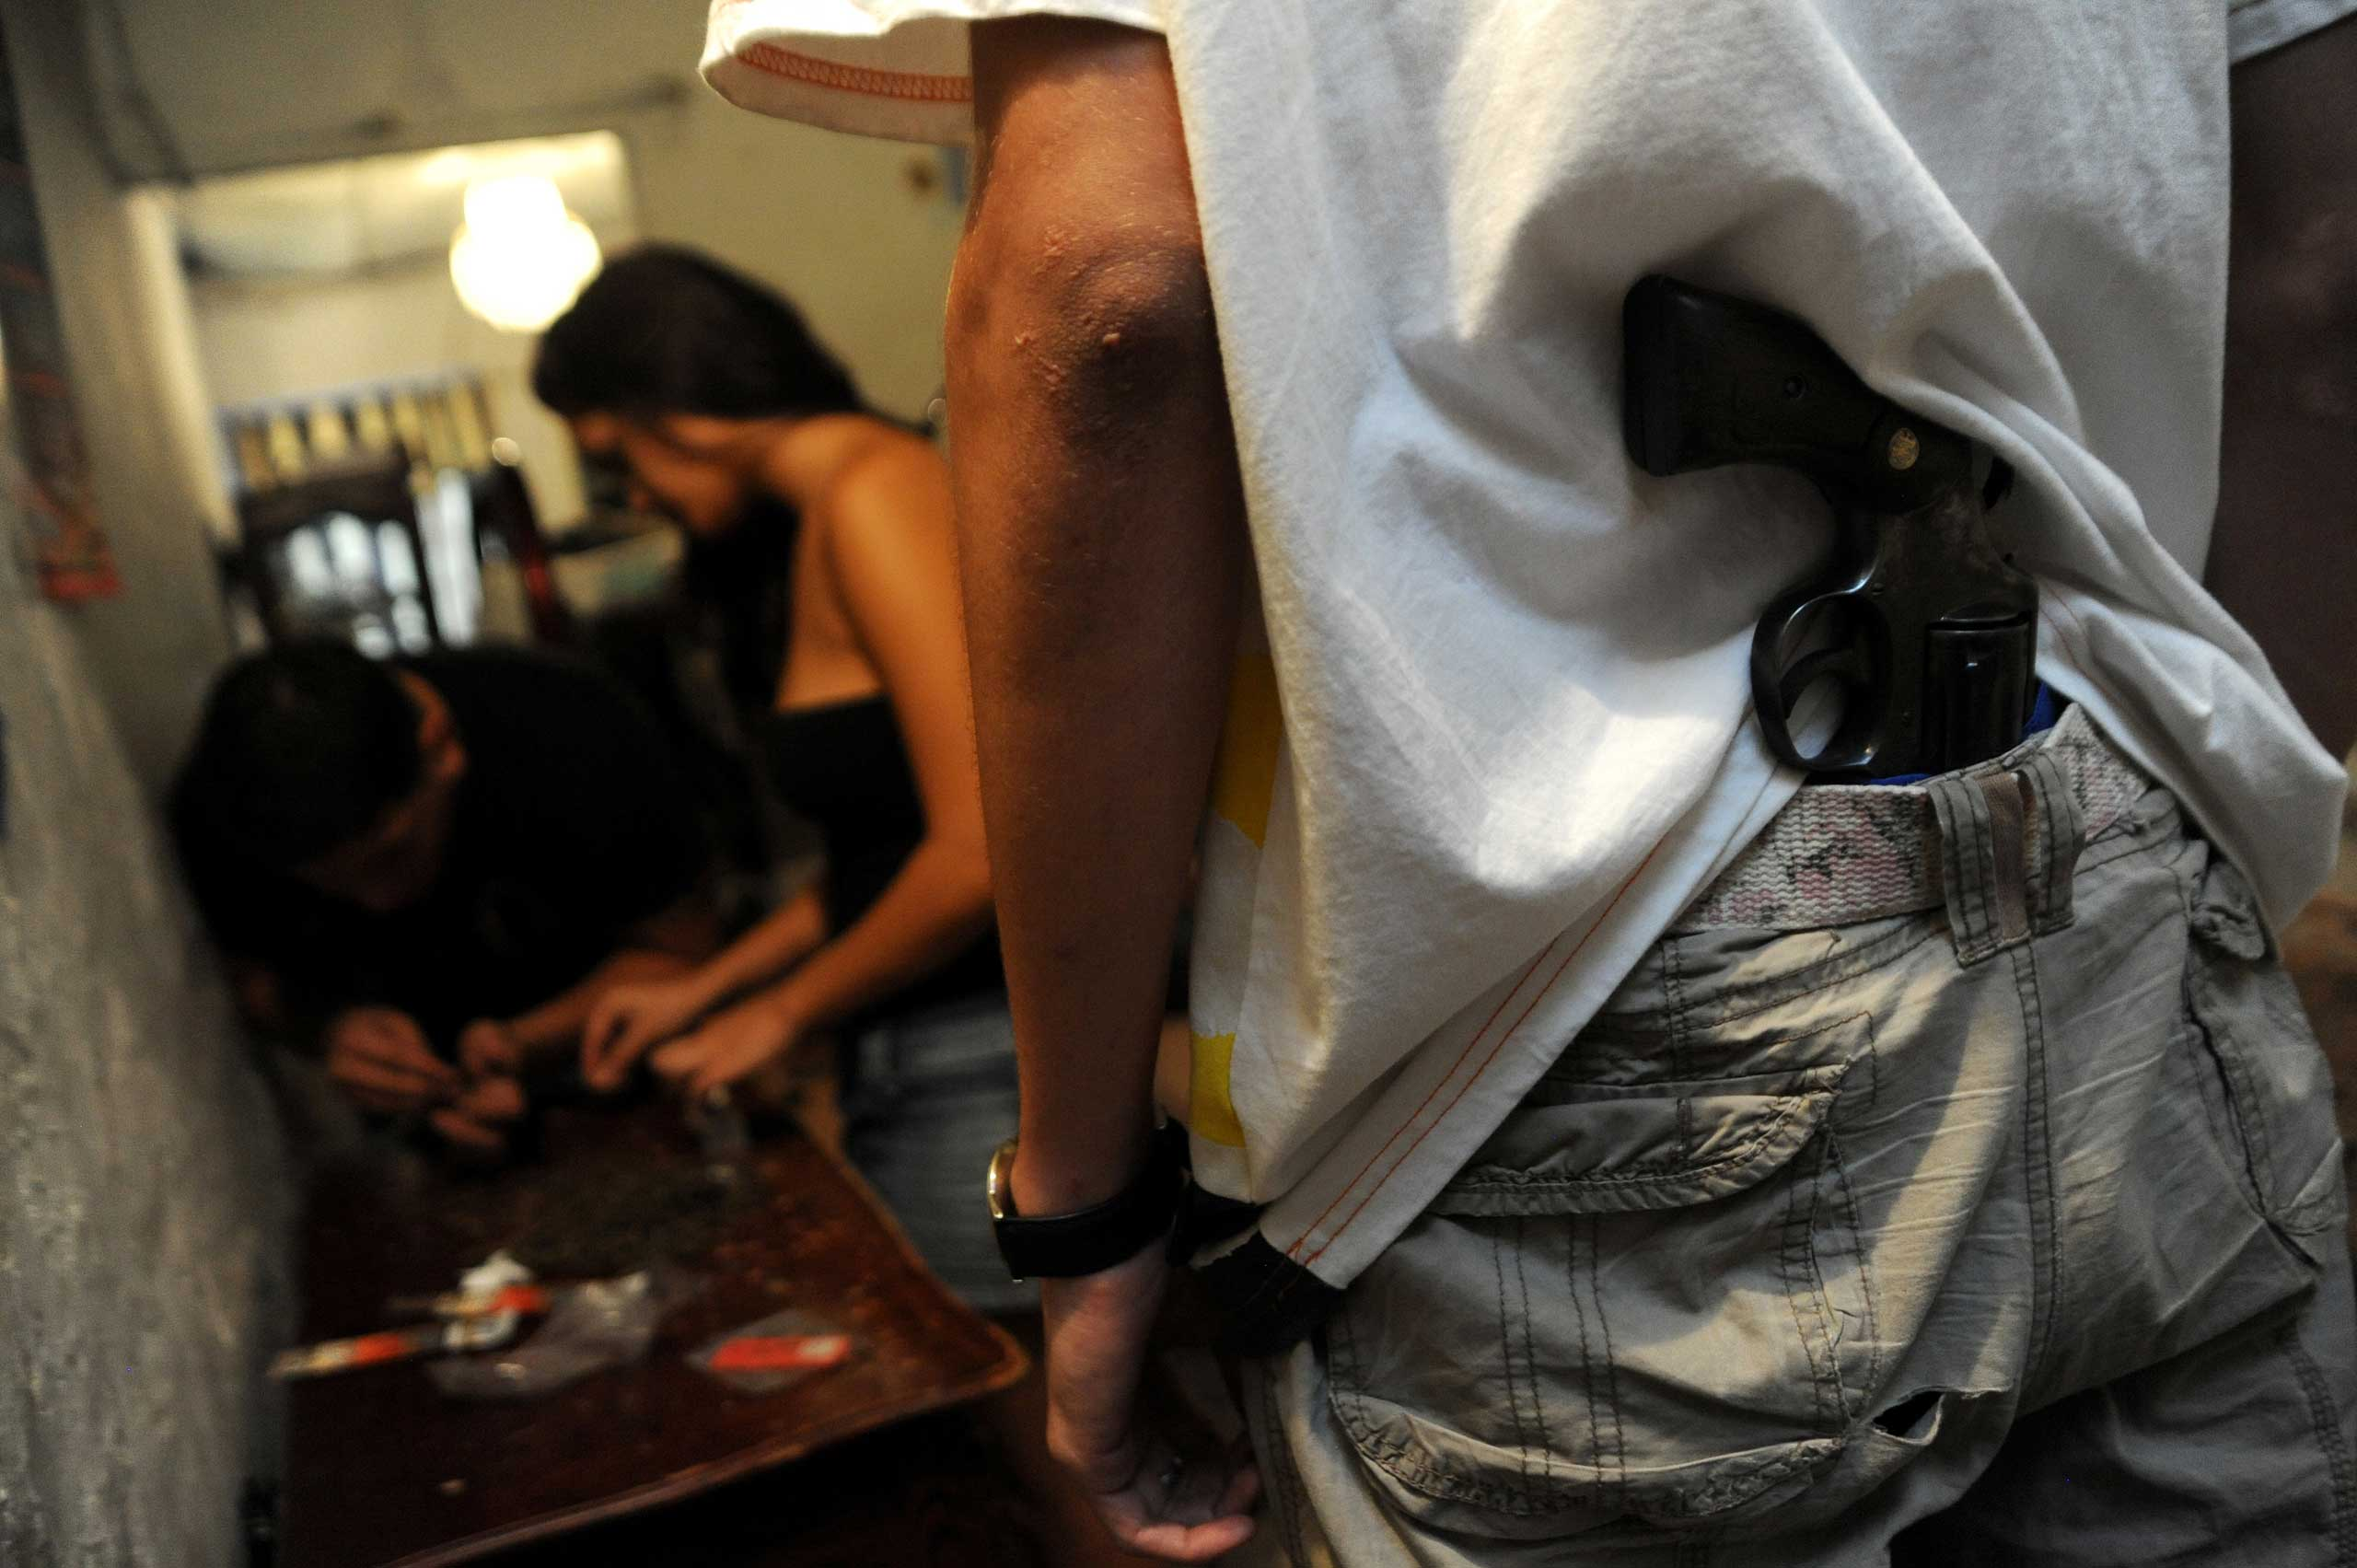 Hitman Gustavo monitors a female member of Medellin based drug cartel Los Sebastianos, as she prepares marijuana, in Comuna 3, a poor neighborhood in Medellin, Colombia.